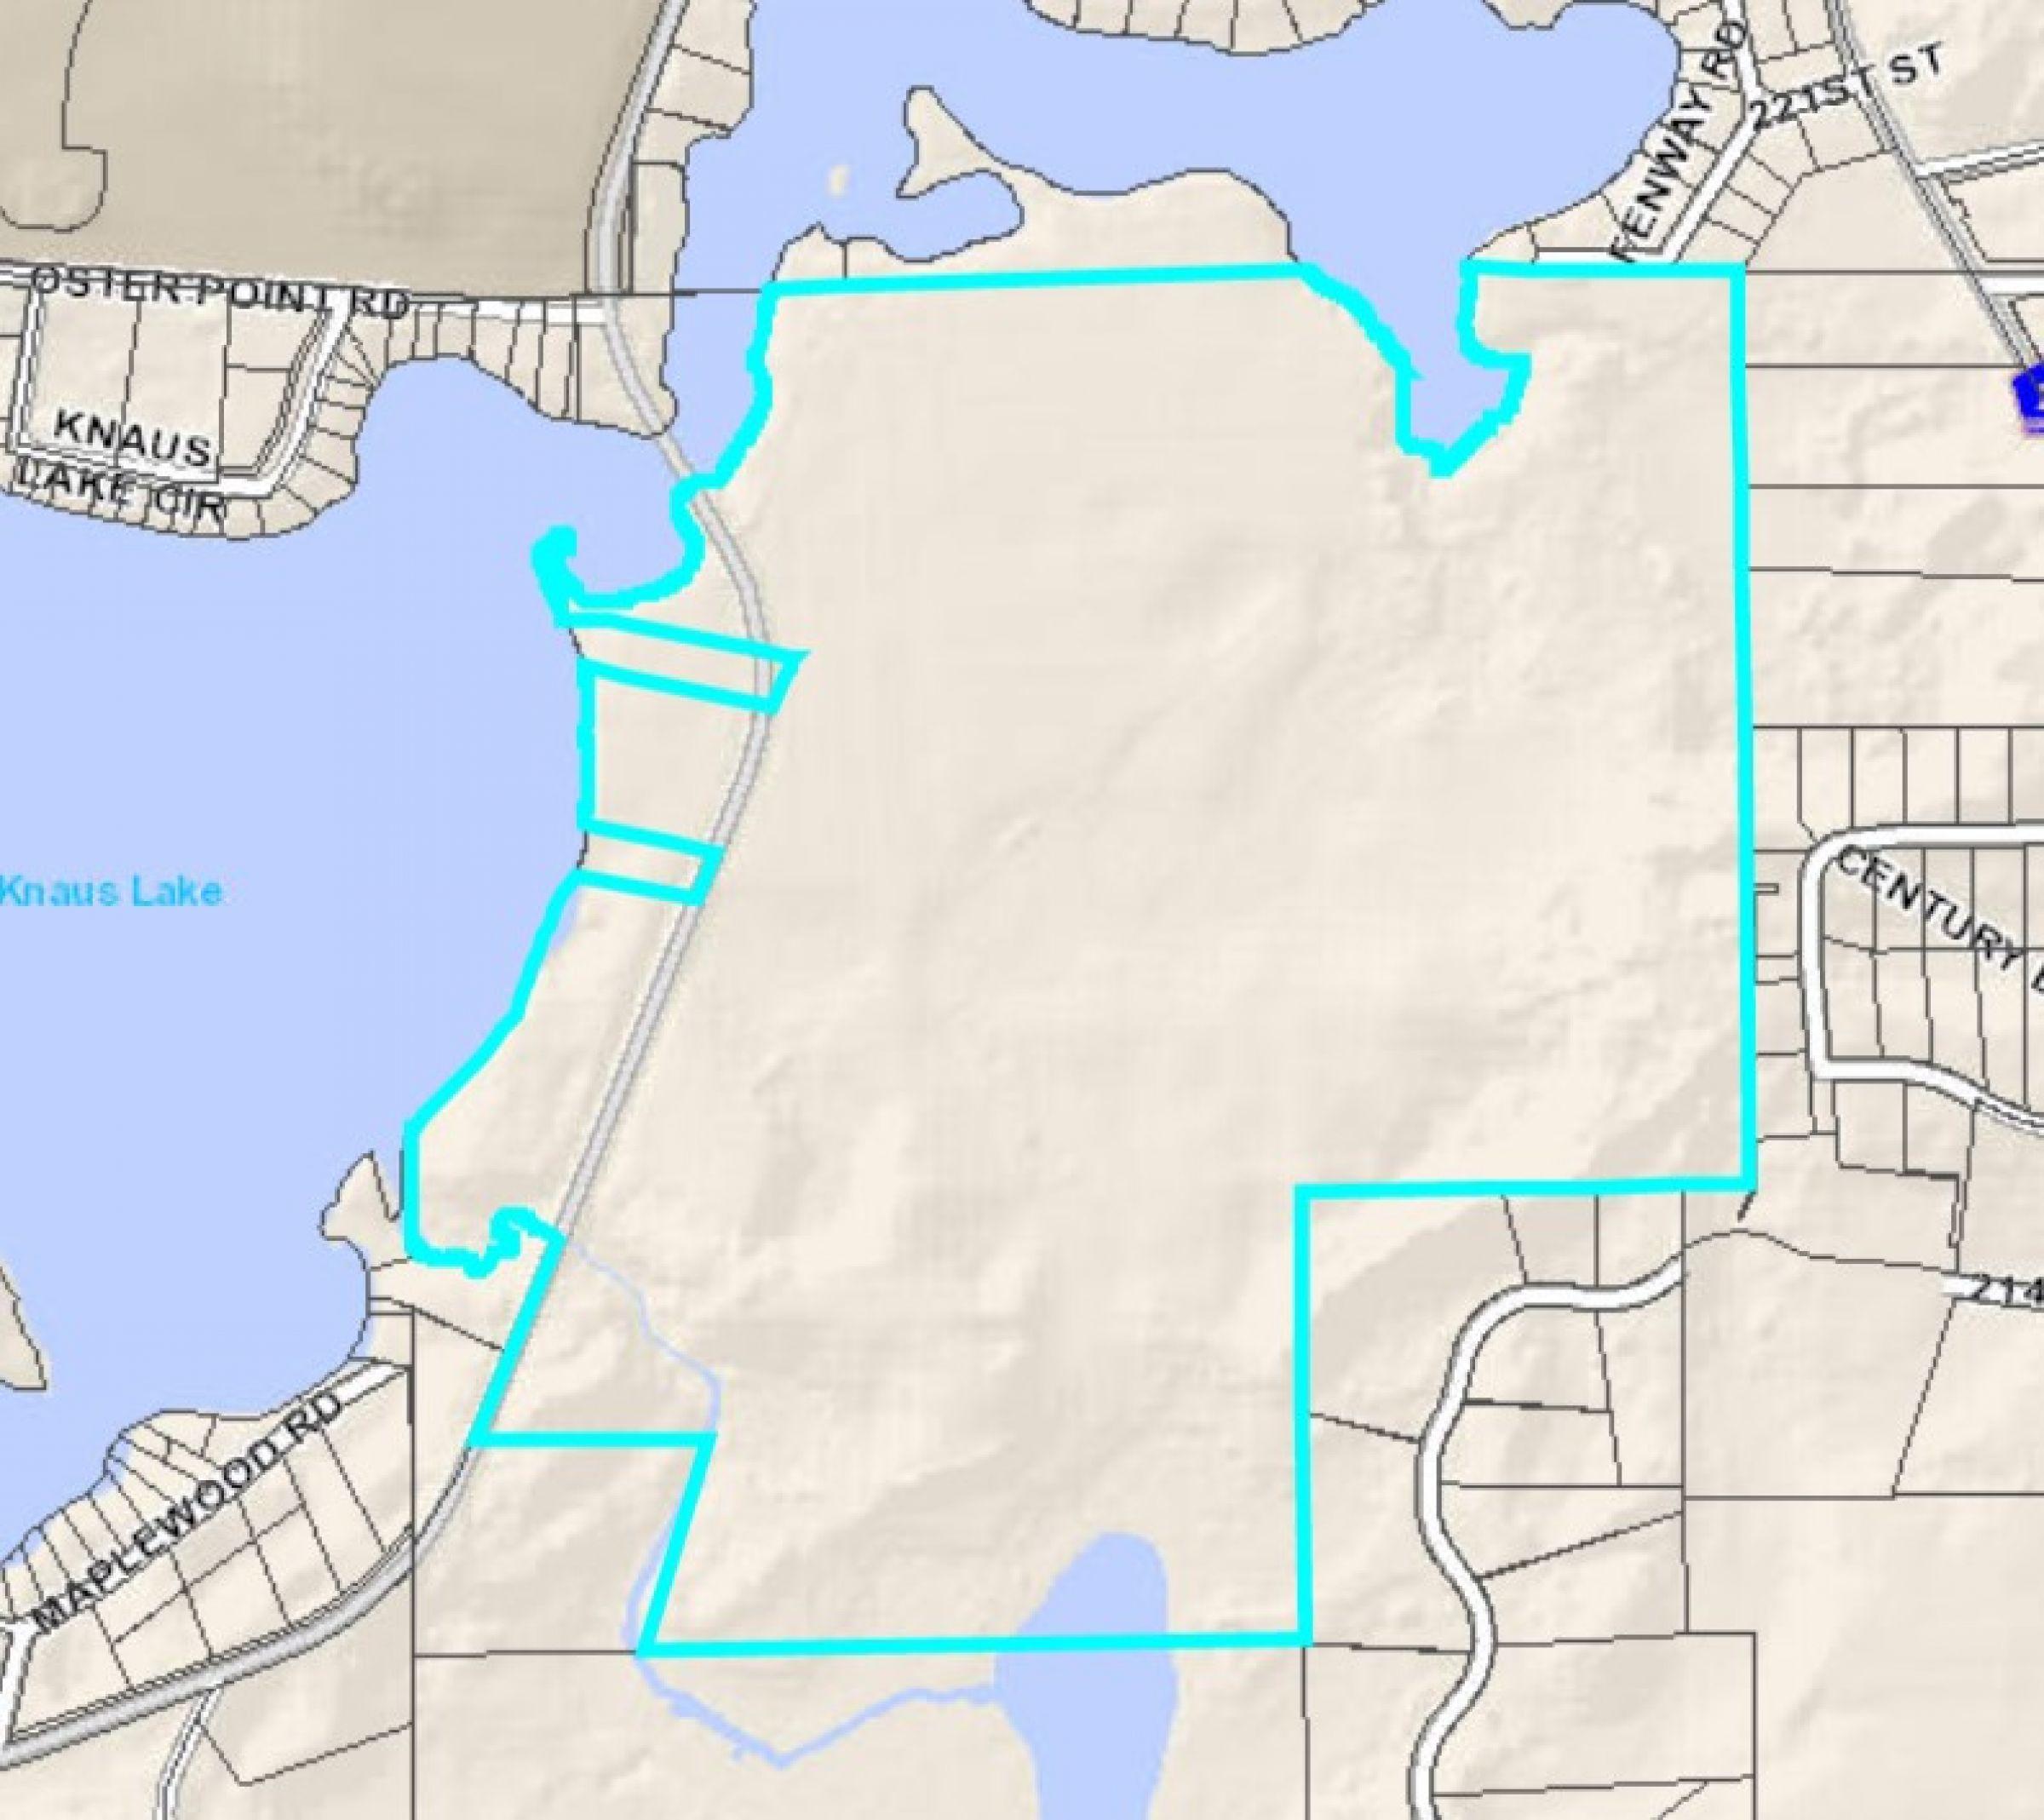 land-stearns-county-minnesota-298-acres-listing-number-15712-0-2021-09-23-125345.jpg